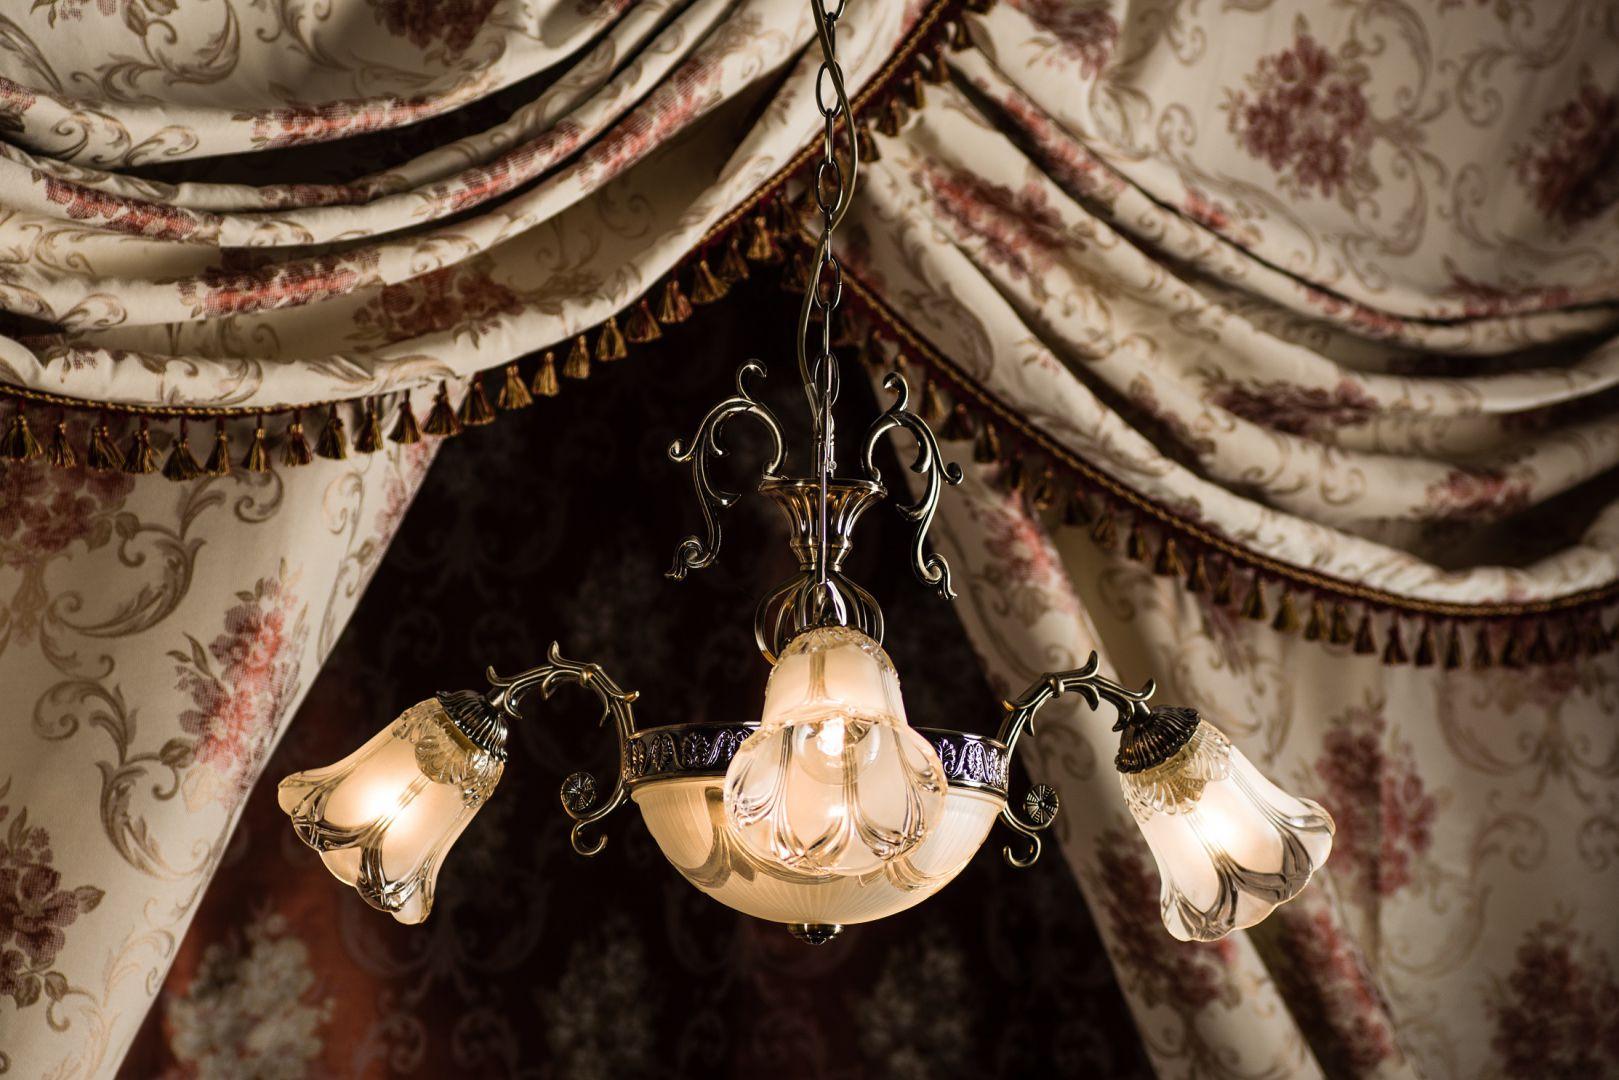 Modne oświetlenie do salonu. Fot. Britop Lighting